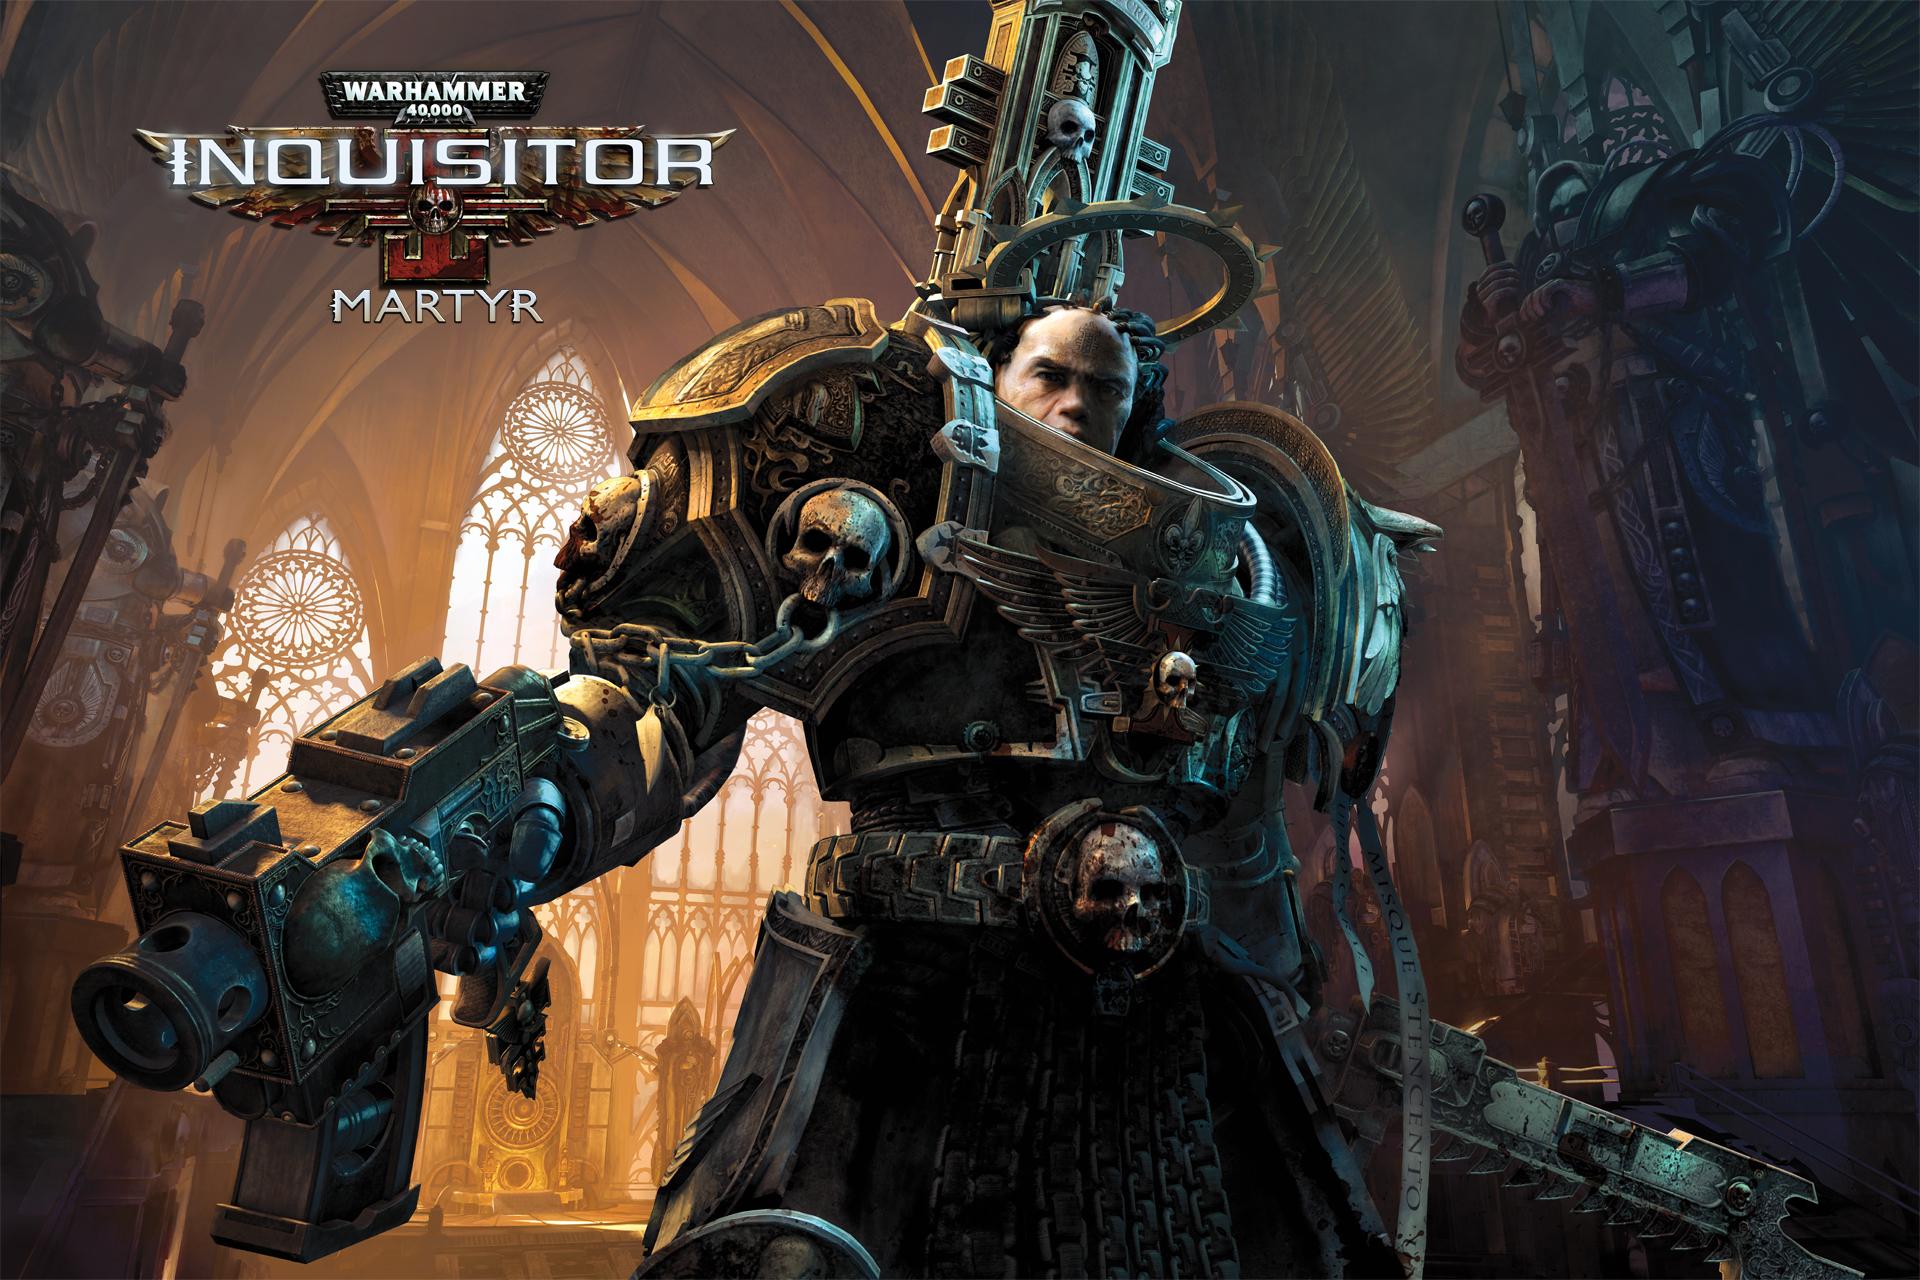 Un nouveau trailer pour Warhammer 40,000 : Inquisitor – Martyr